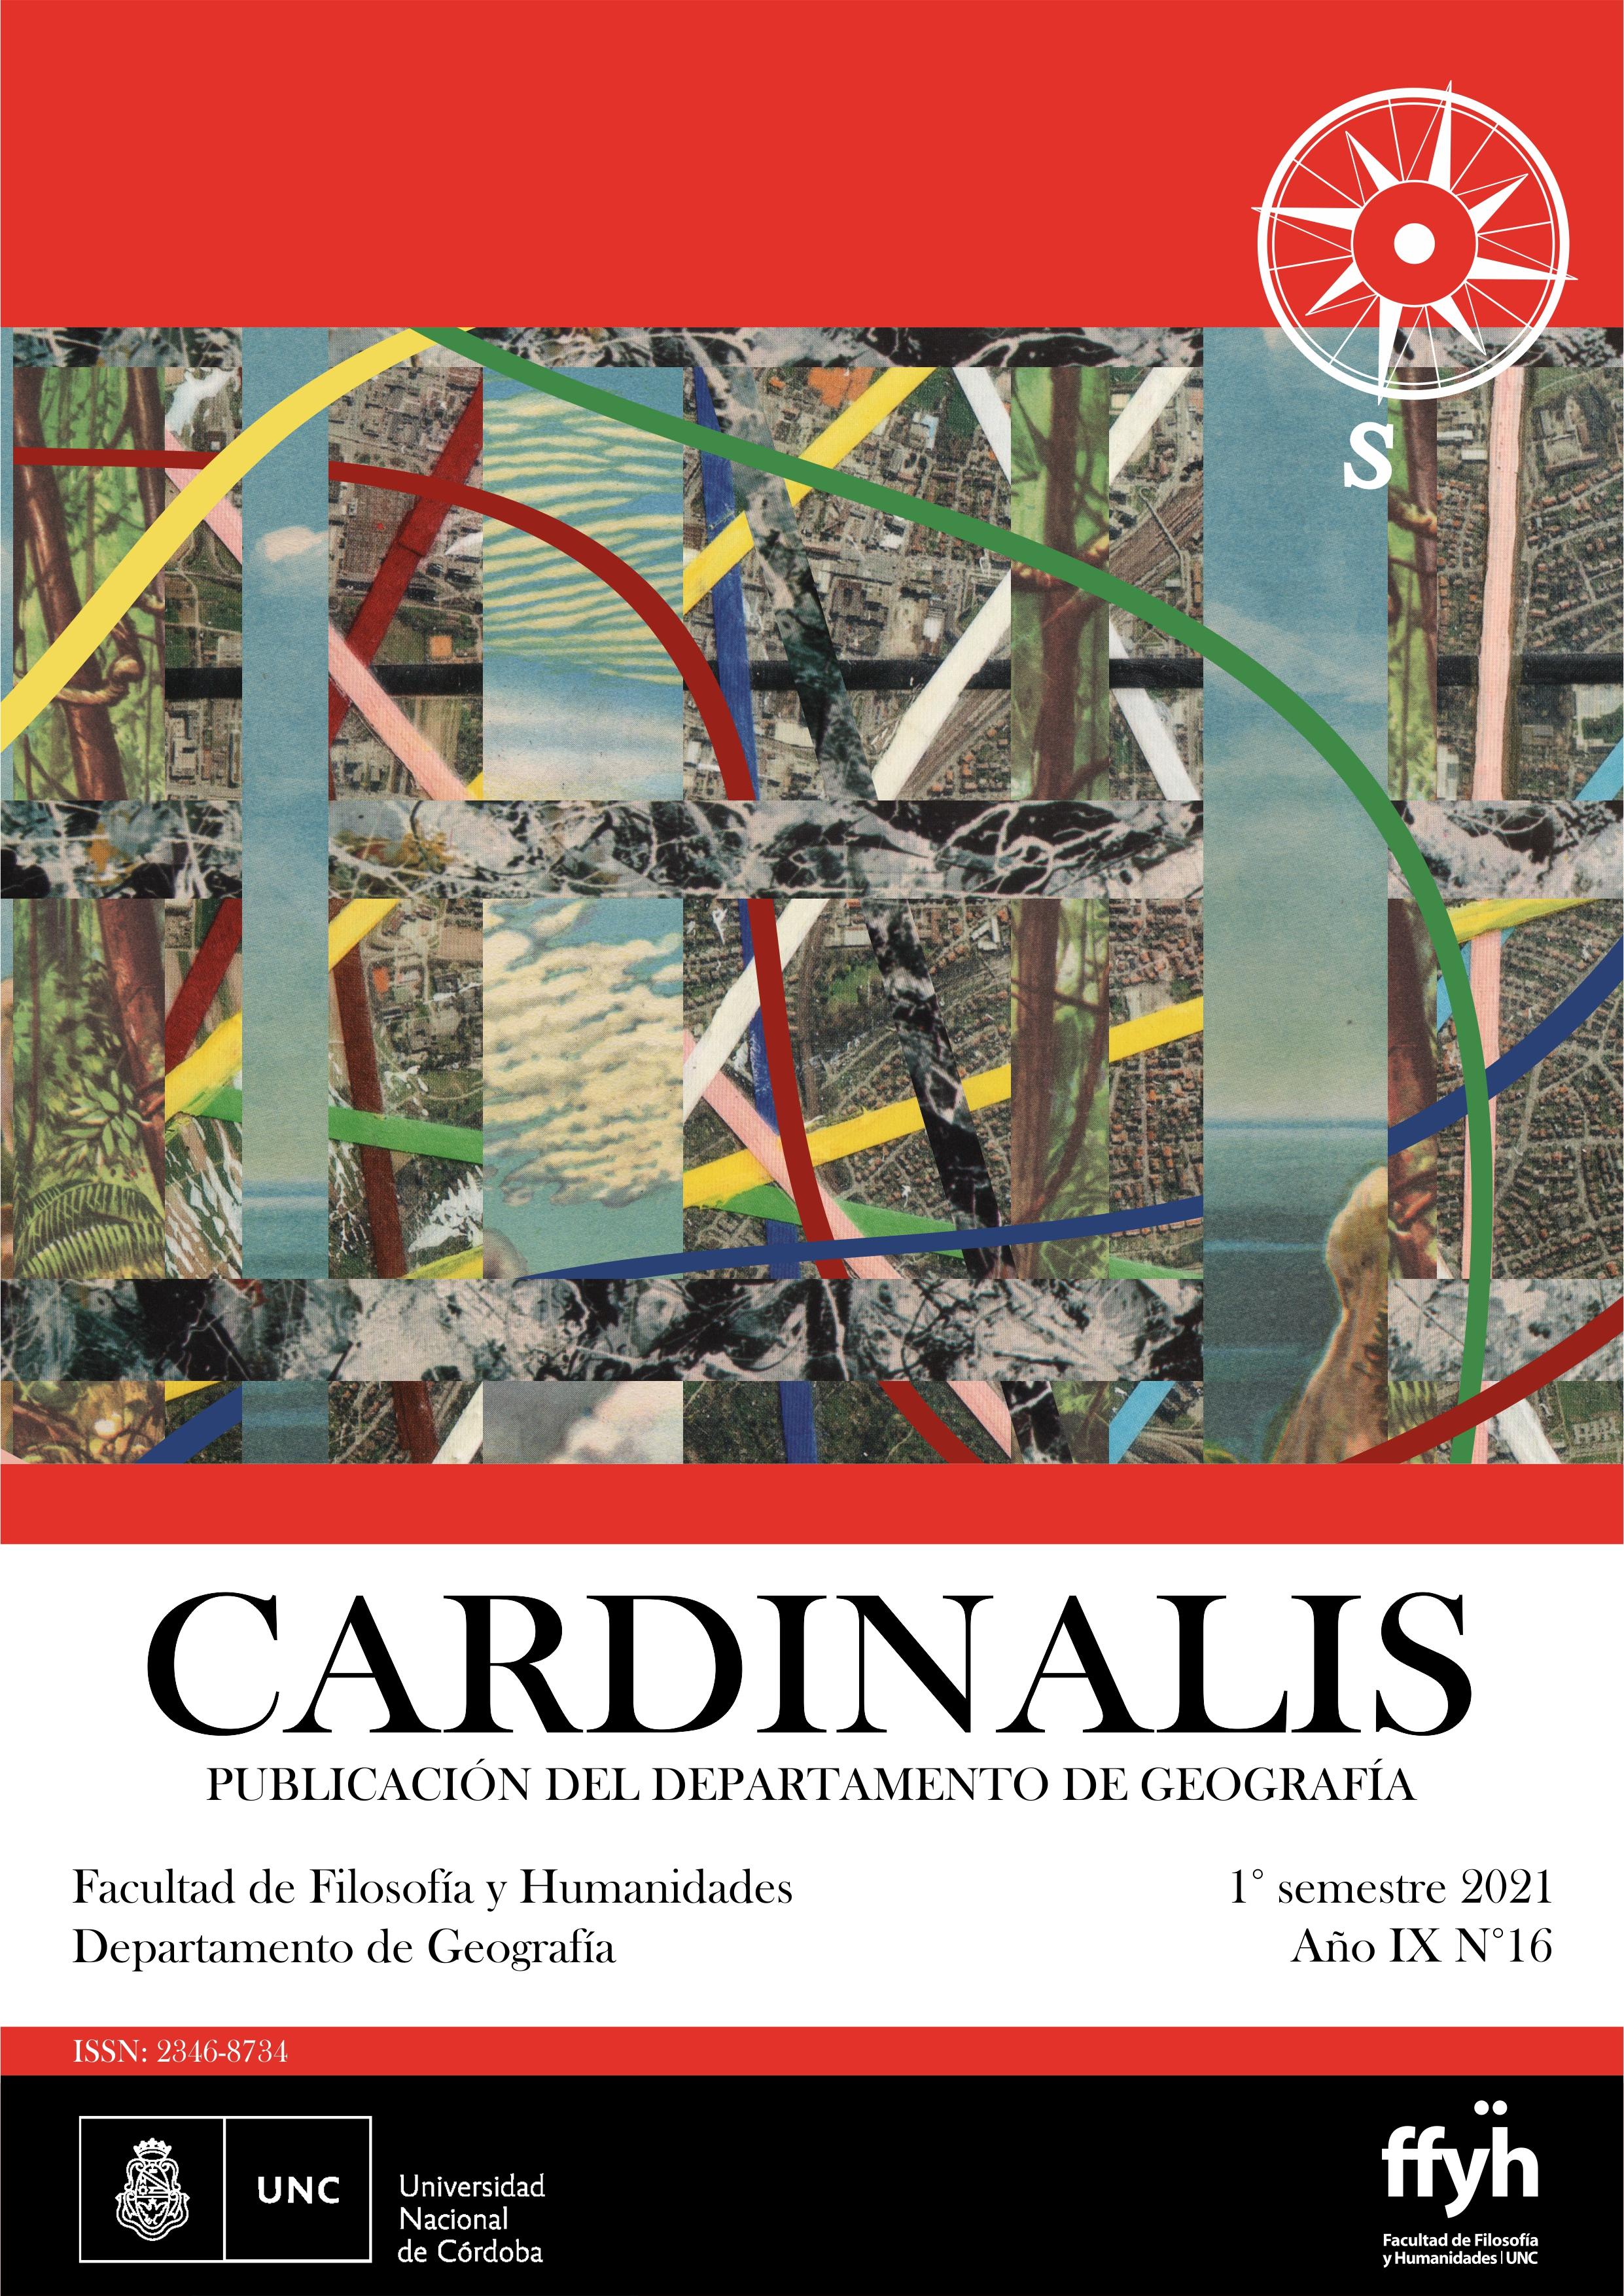 Arte de tapa: Collage Digital, autor: Vicente Girardi Callafa. Diseño de tapa: Nadia Finck.